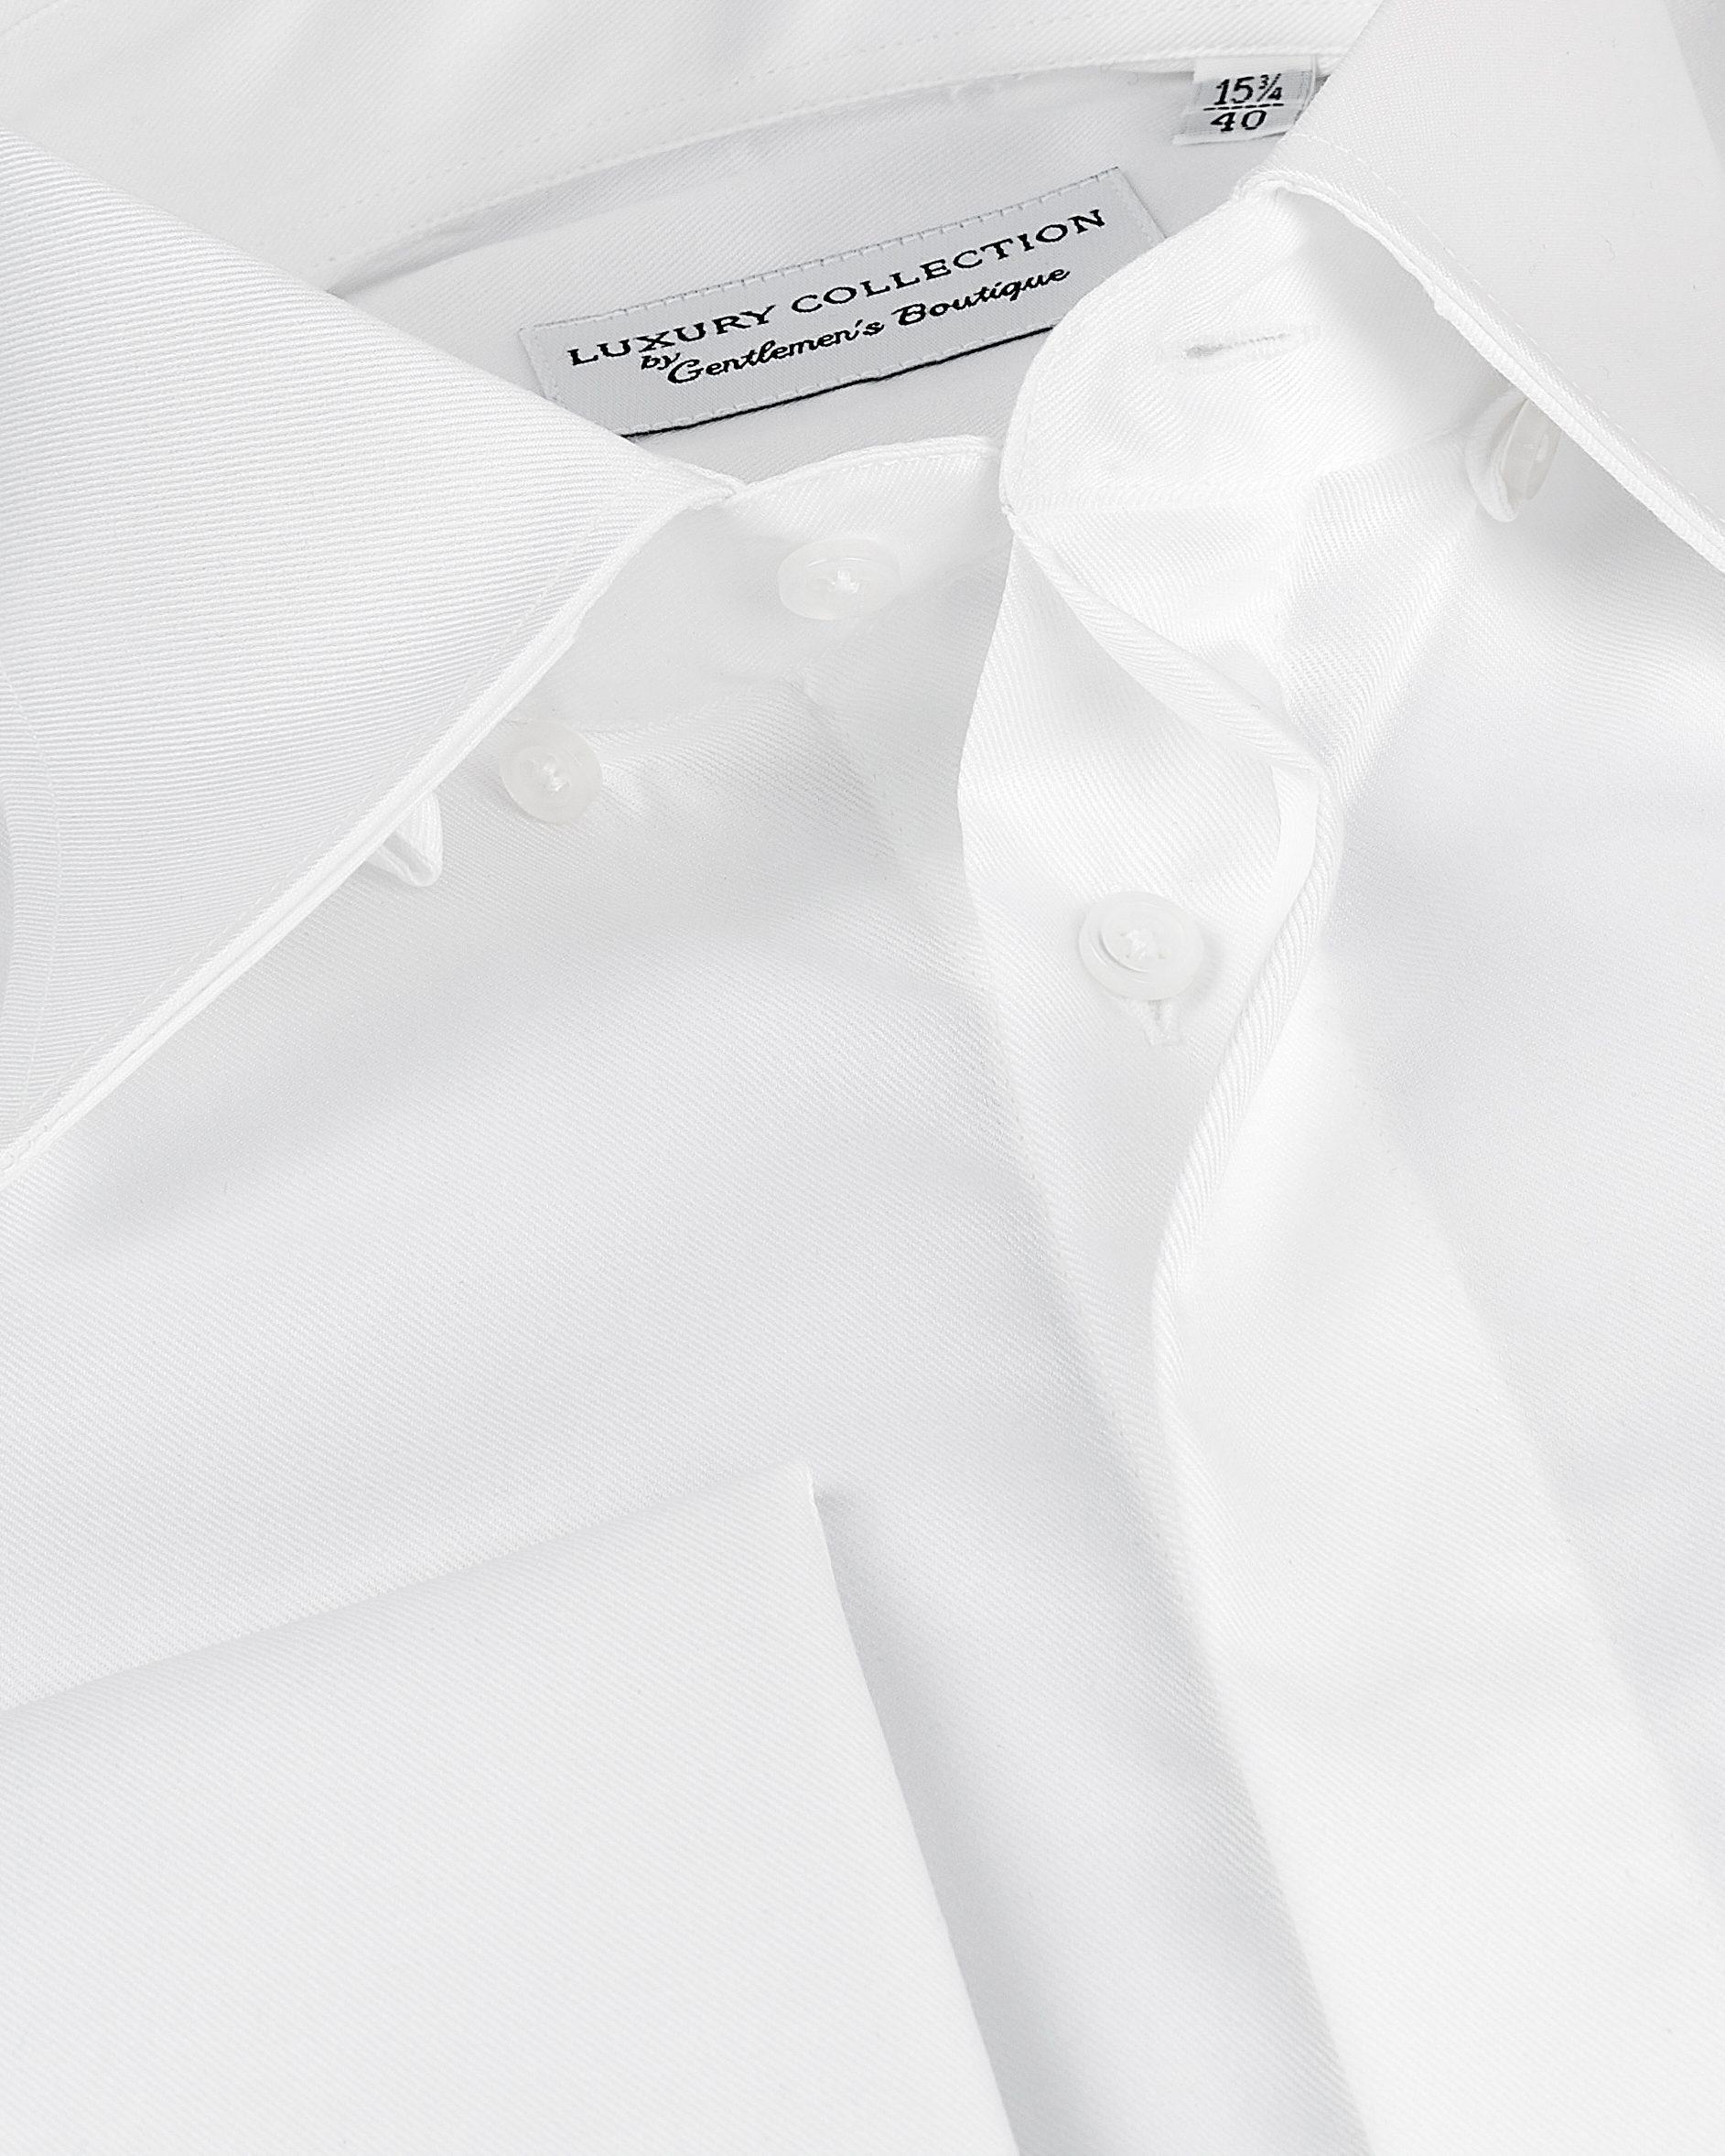 Camasa-Ceremonie-Barbati-Alba-Cu-Butoni-Detaliu-Guler-Italienesc-Gentlemens-Boutique-Gold-Magazin-Costume-Barbati-Cluj-Napoca-Strada-Soporului-